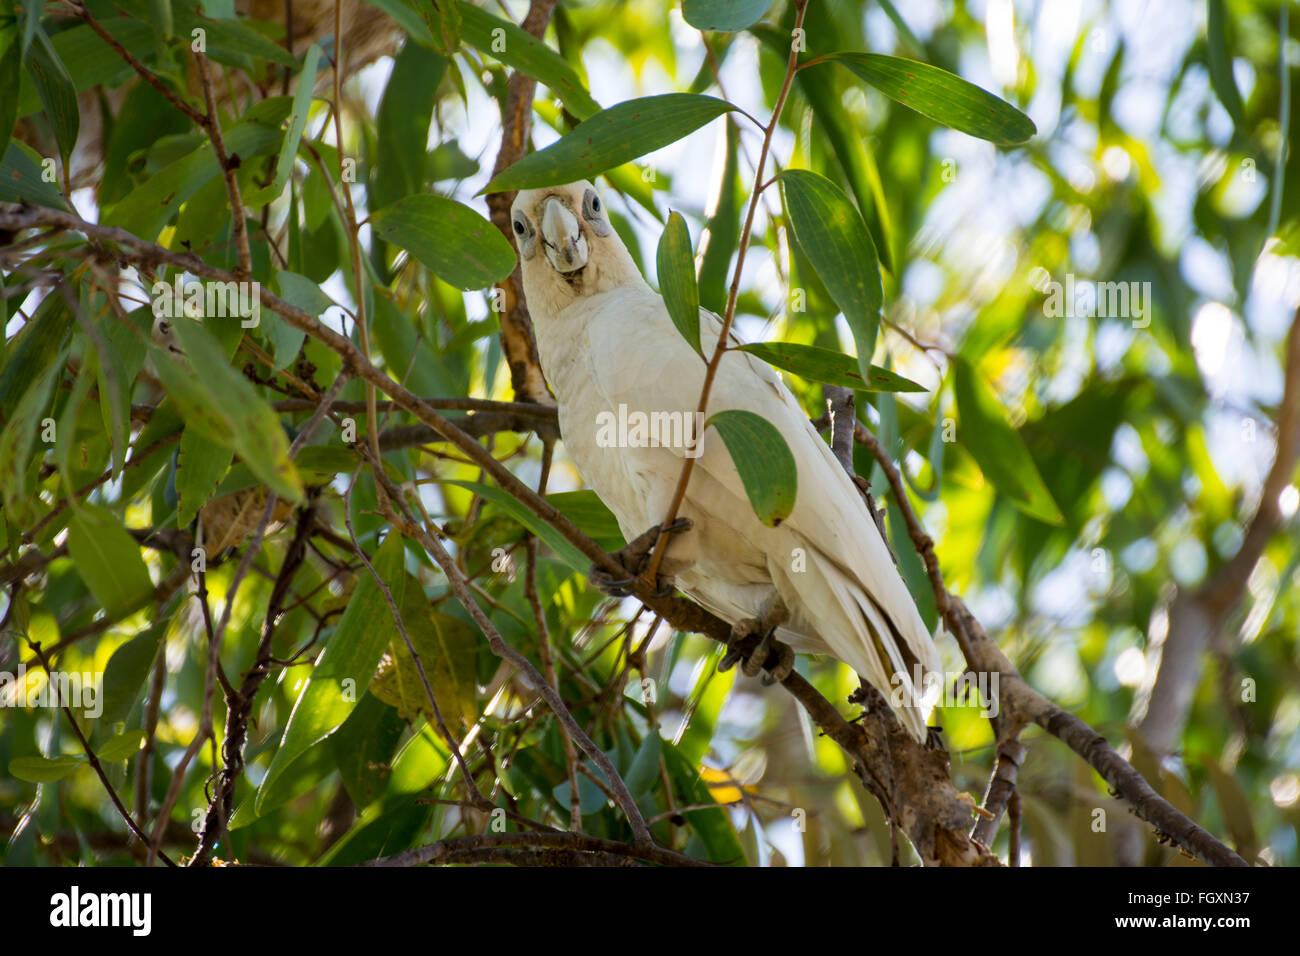 Little Corella bird in Australia - Stock Image